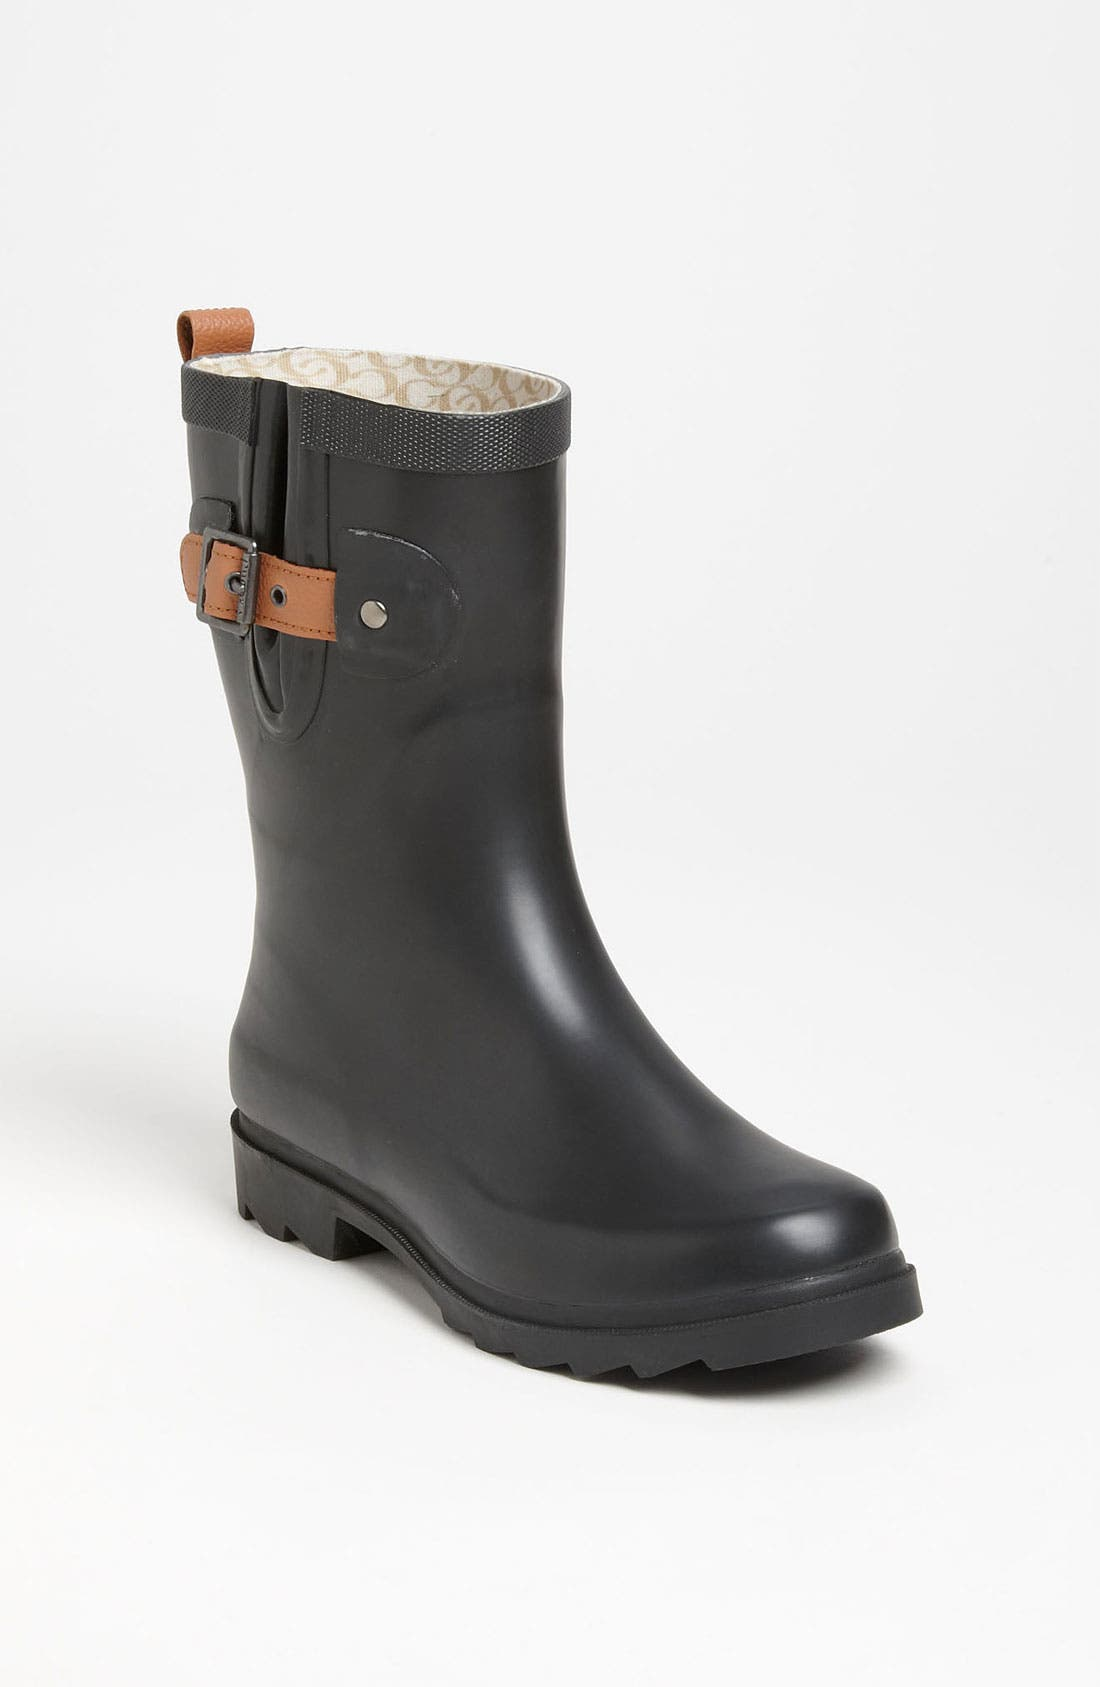 CHOOKA 'Top Solid Mid Height' Rain Boot, Main, color, 001